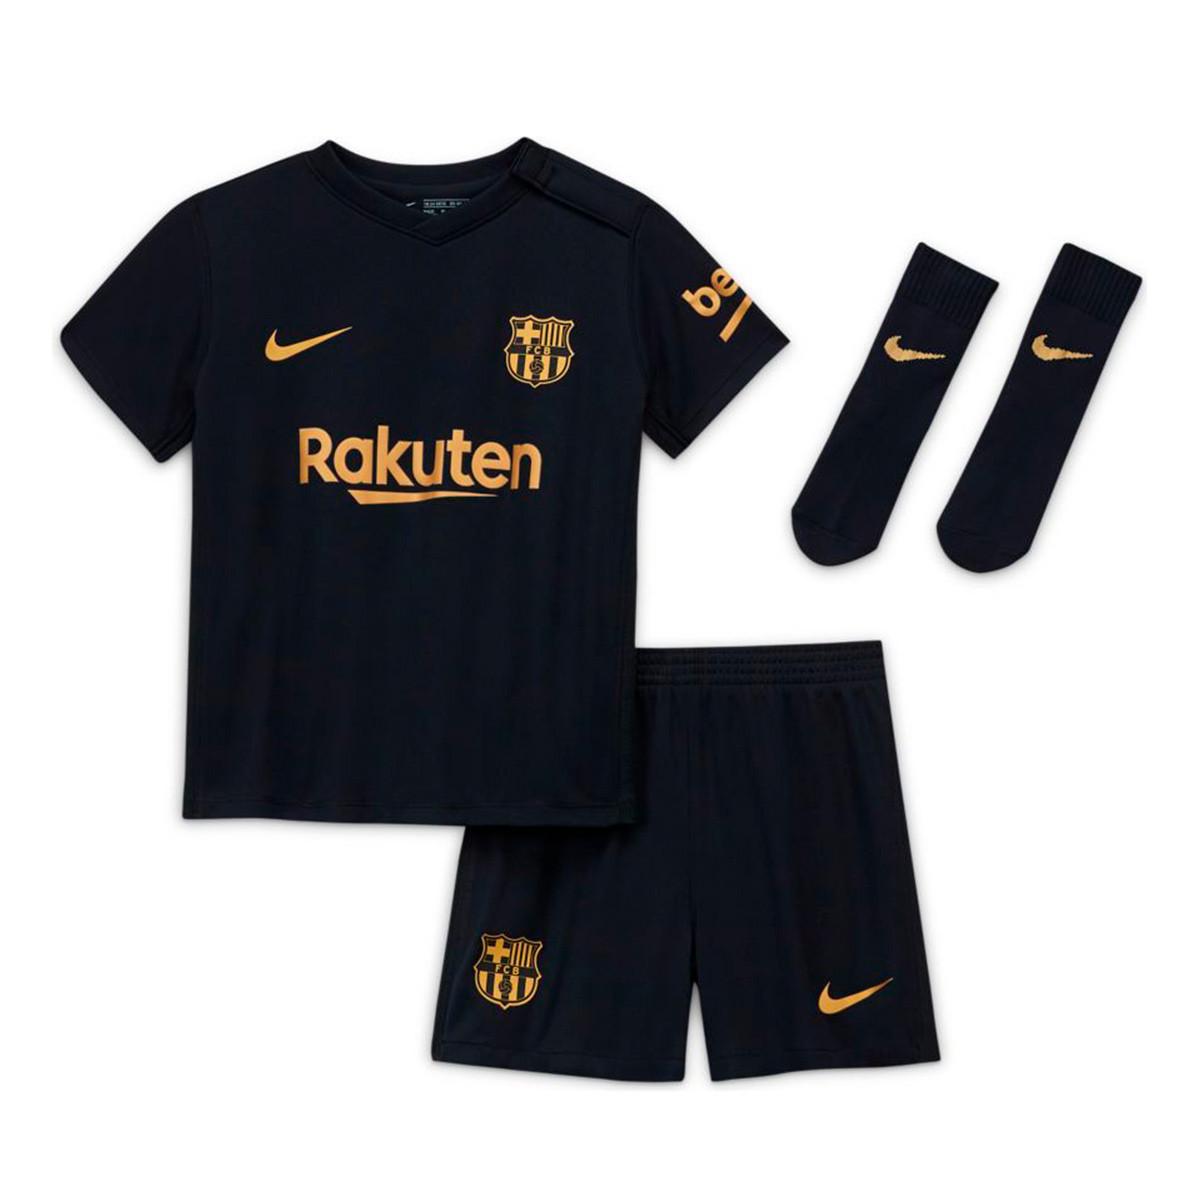 Kit Nike Fc Barcelona Segunda Equipacion 2020 2021 Bebe Black Metallic Gold Football Store Futbol Emotion